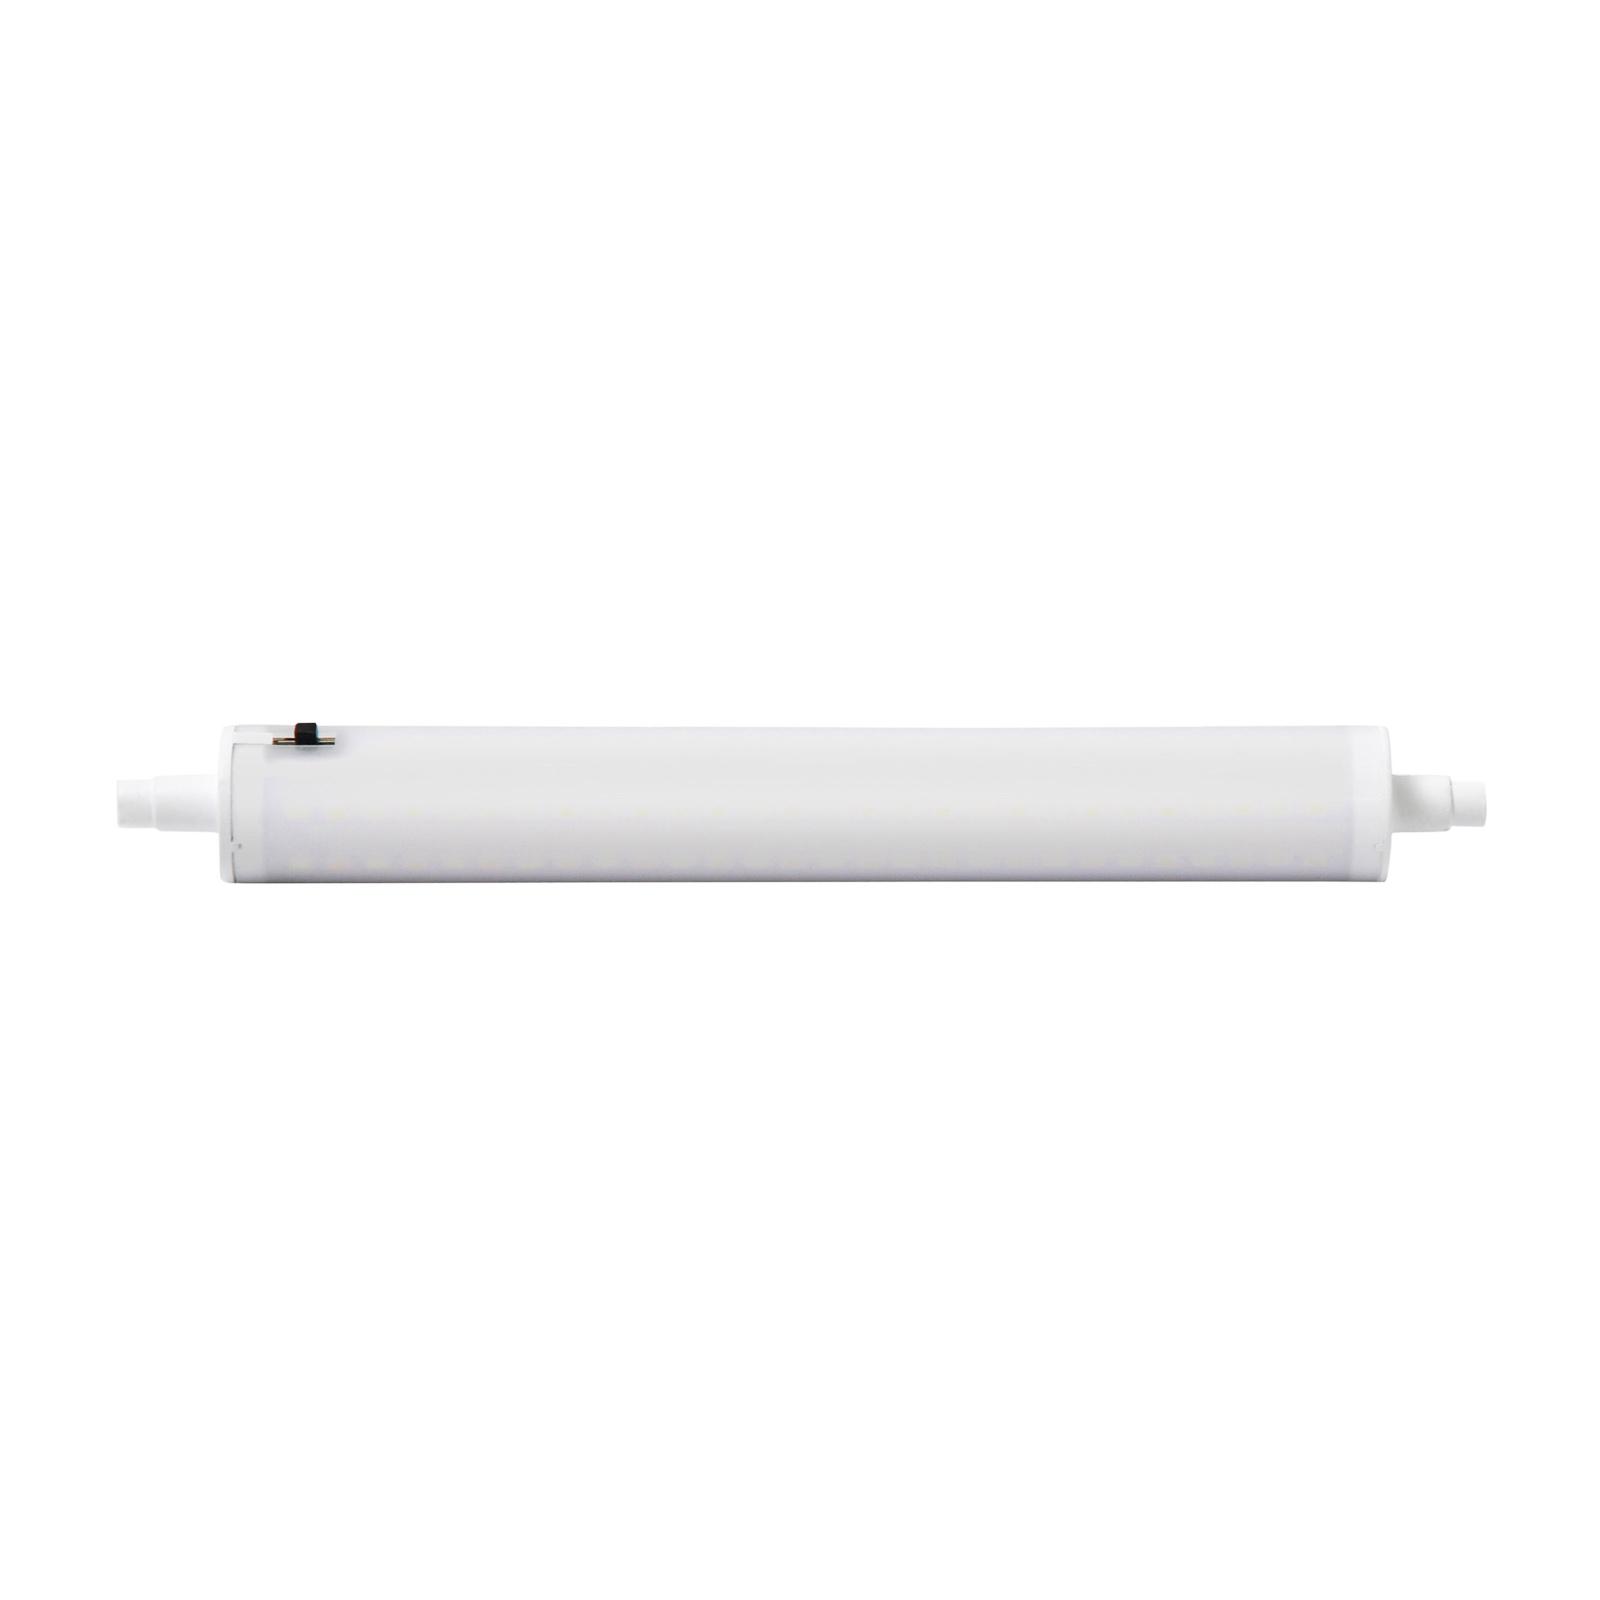 Żarówka LED R7s 10,5W, 18,9 cm, 1100 lm, CCT